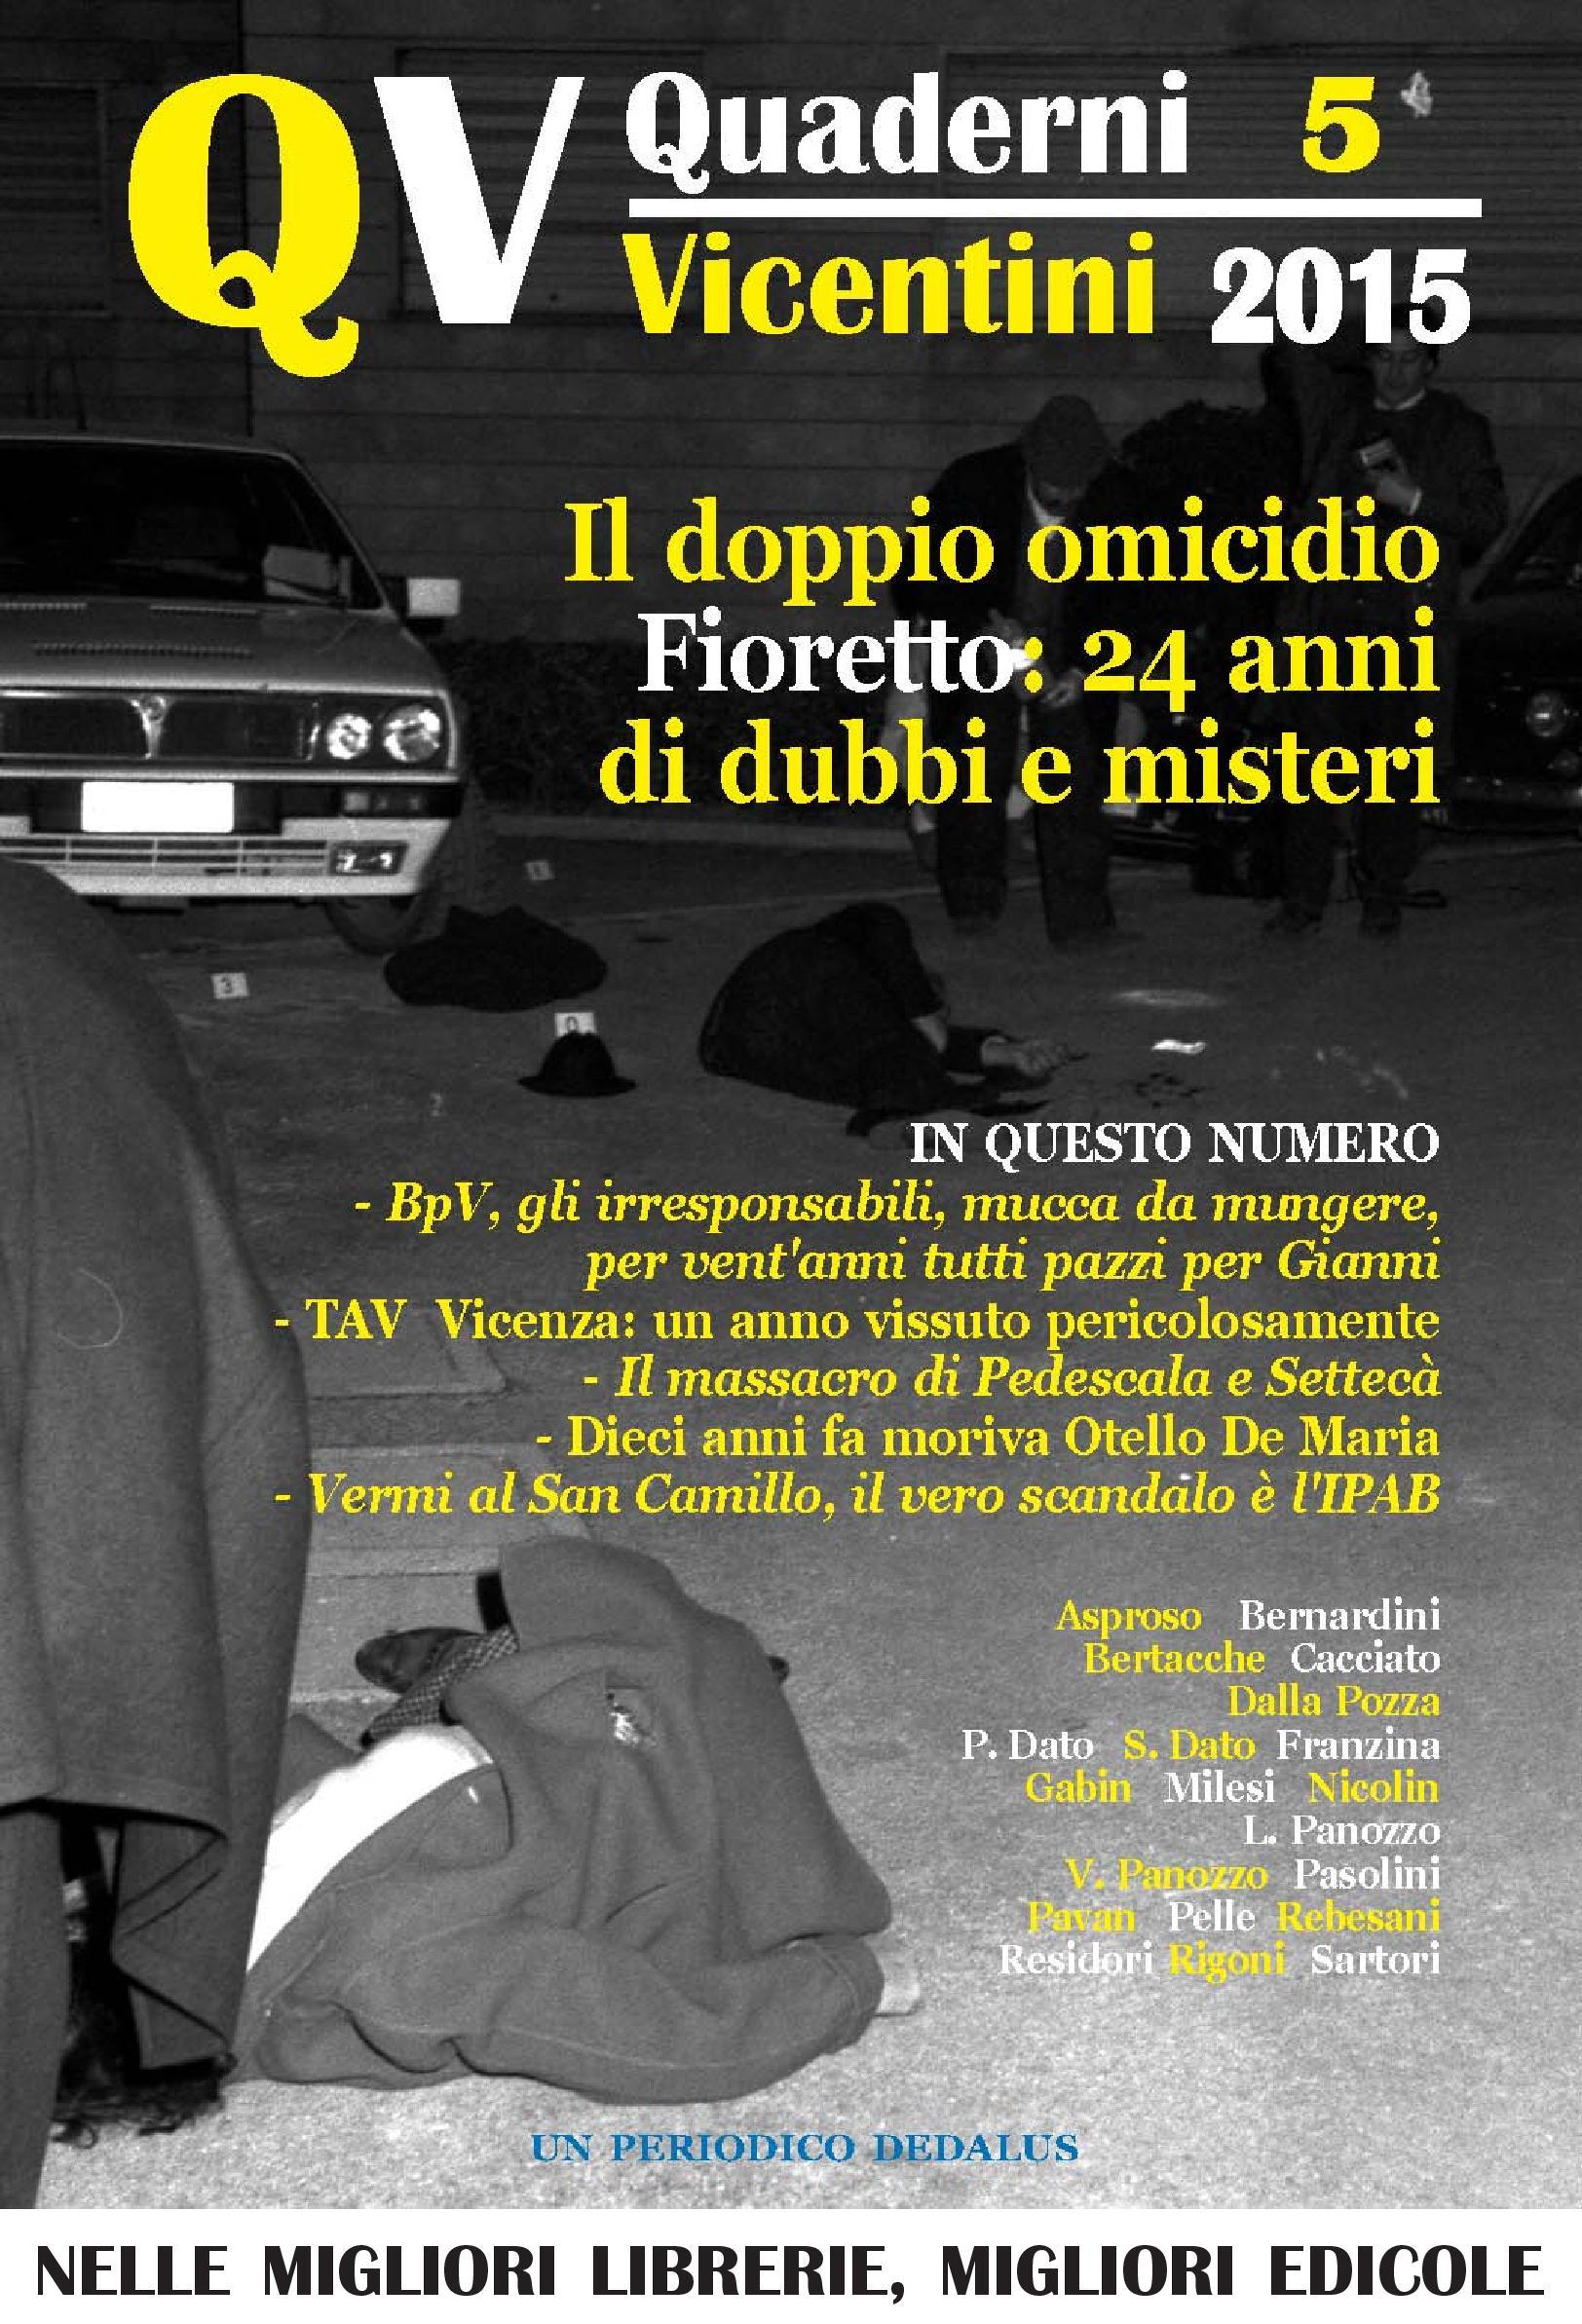 5-2015 - quadernivicentini.it - QV